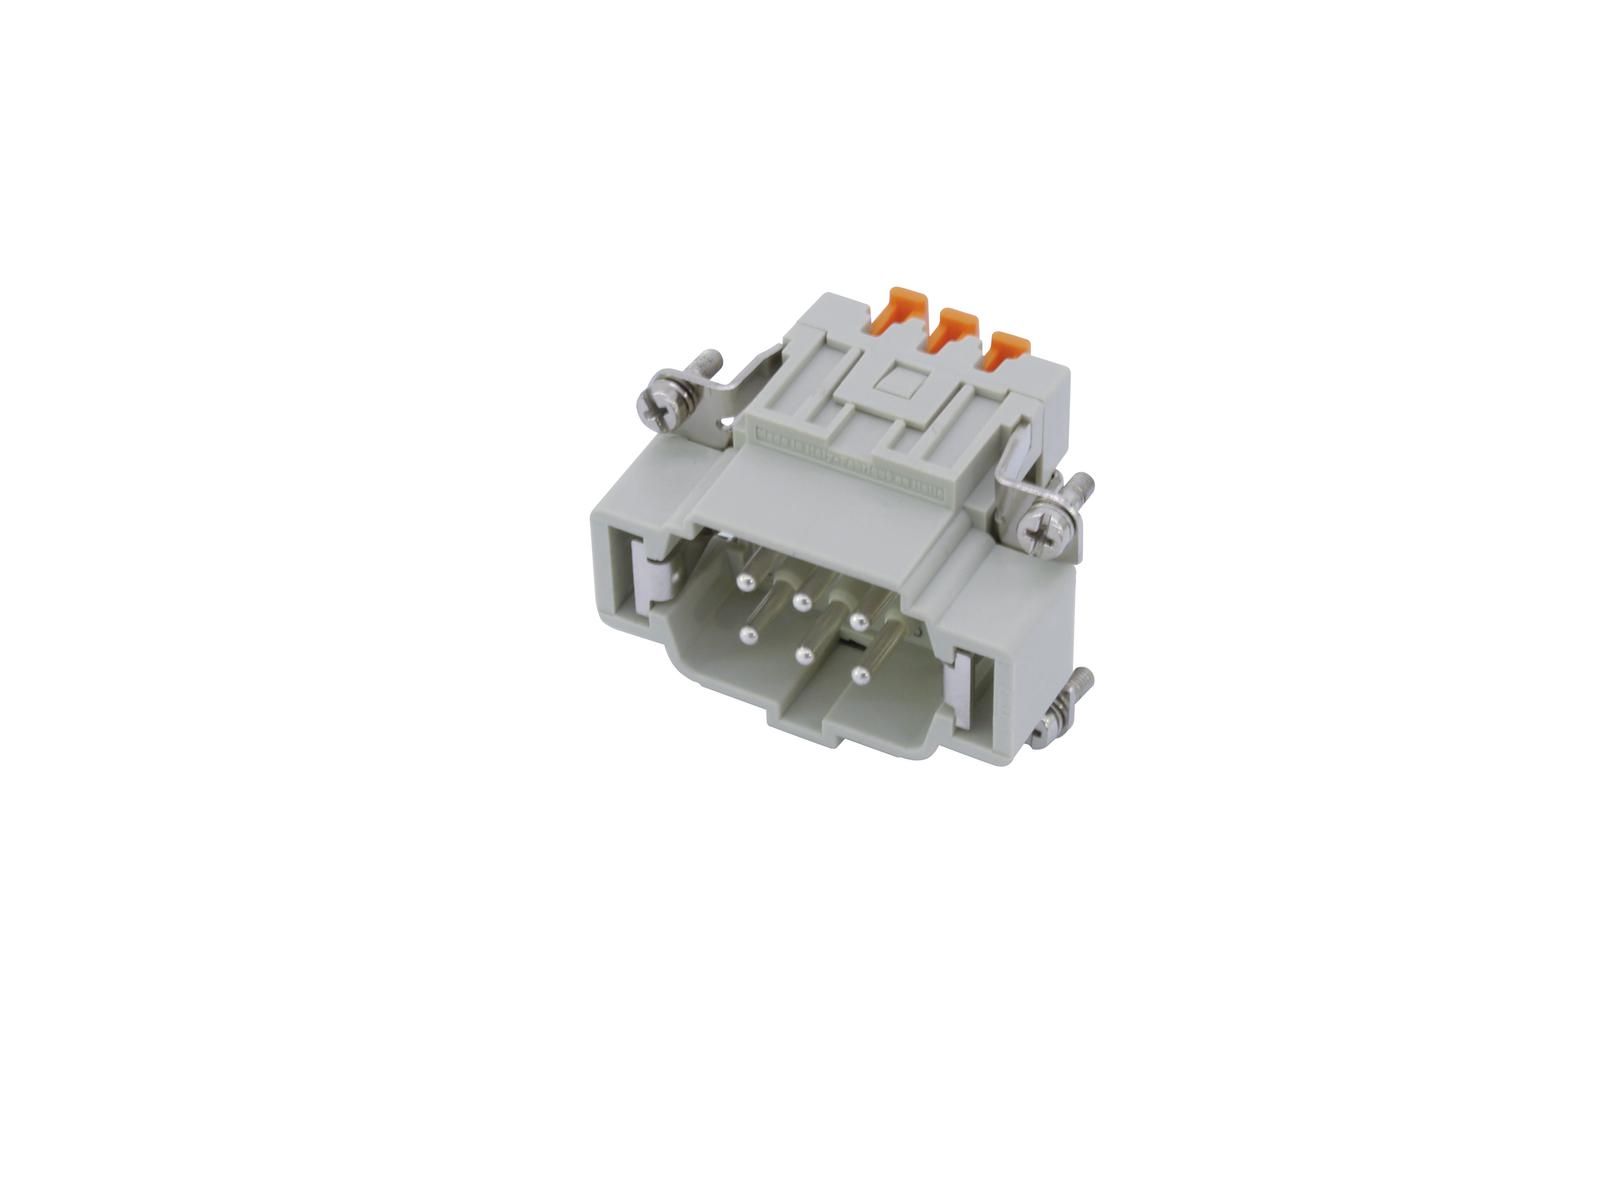 ILME SQUICH Steckereinsatz 6-pol 16A 500V